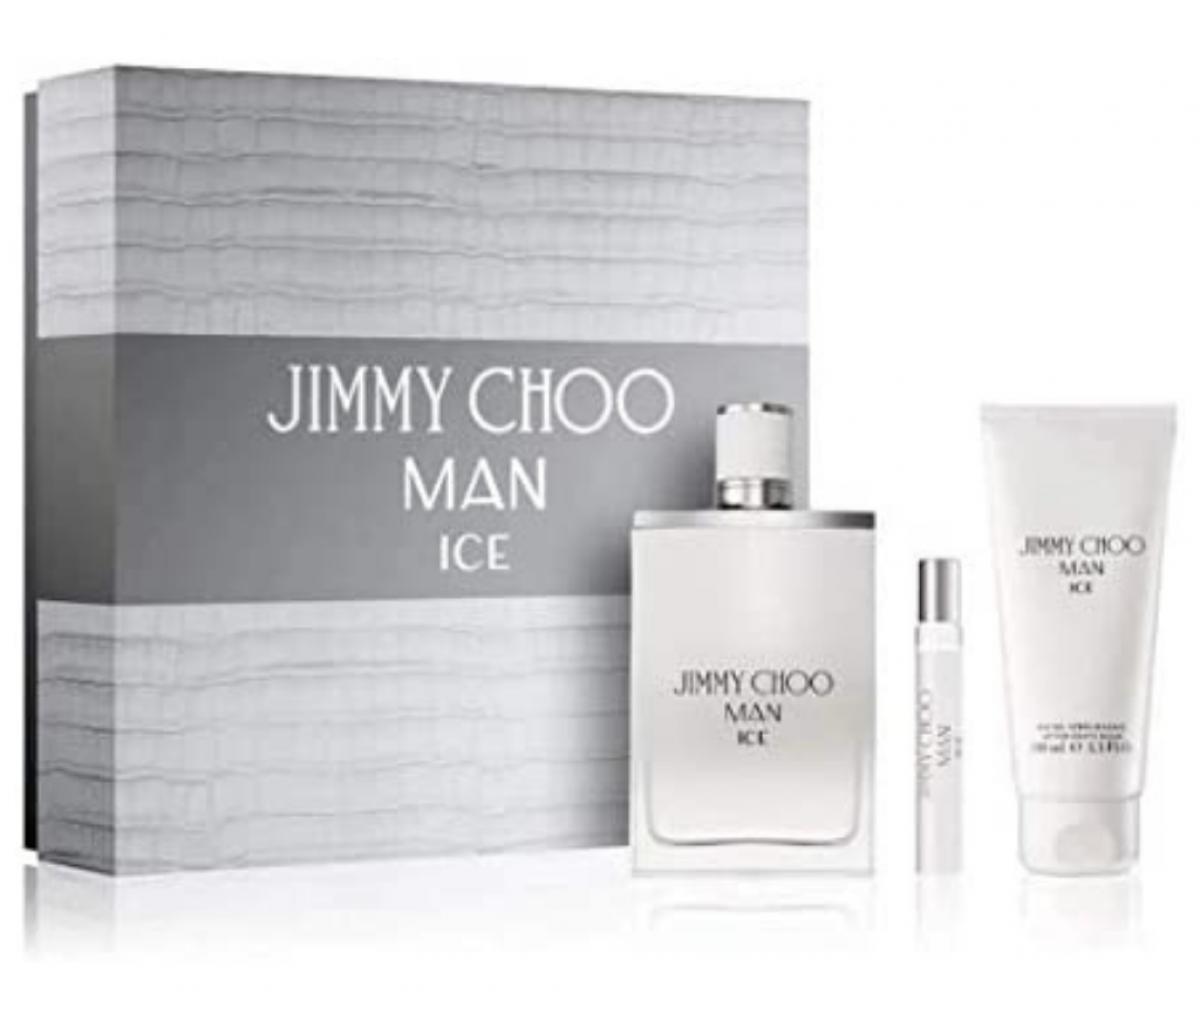 Jimmy Choo Ice M Edt 100ml+A Shv  B 100ml+Mini 7.5ml Set